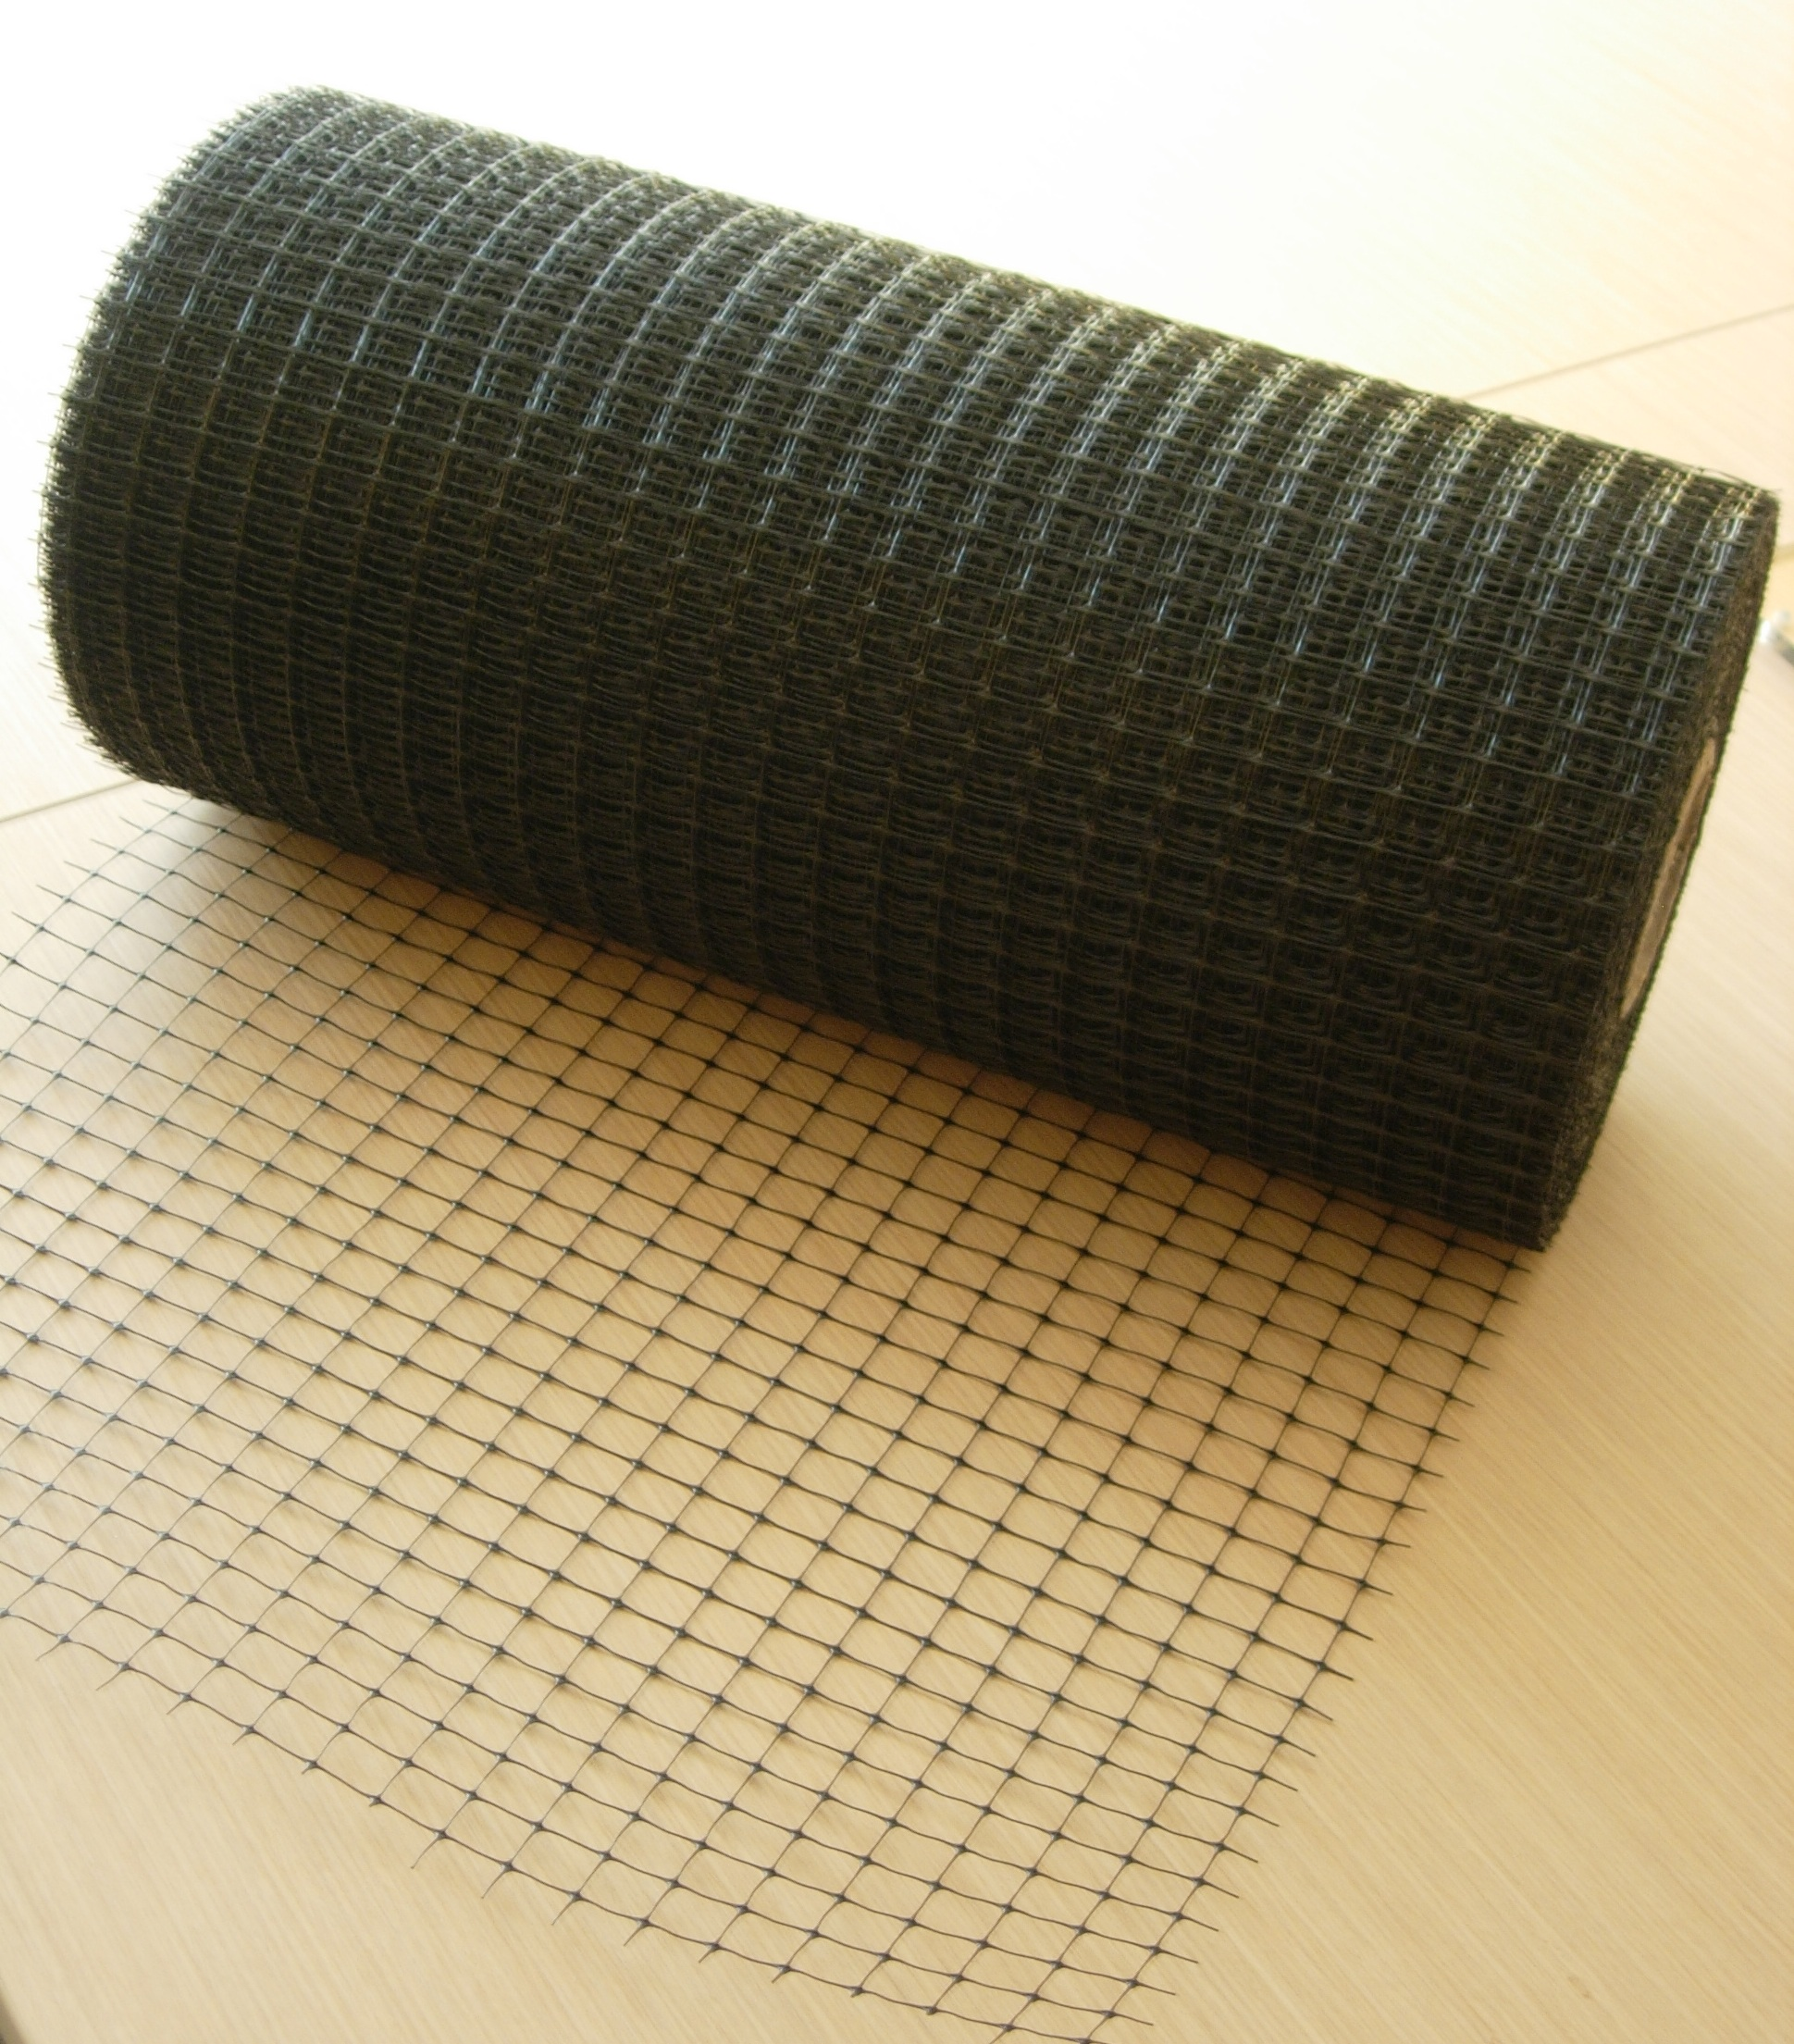 b8c3f1efac9f Malla negra de polietileno ancho 0,5 m (300 metros, 150 m2)